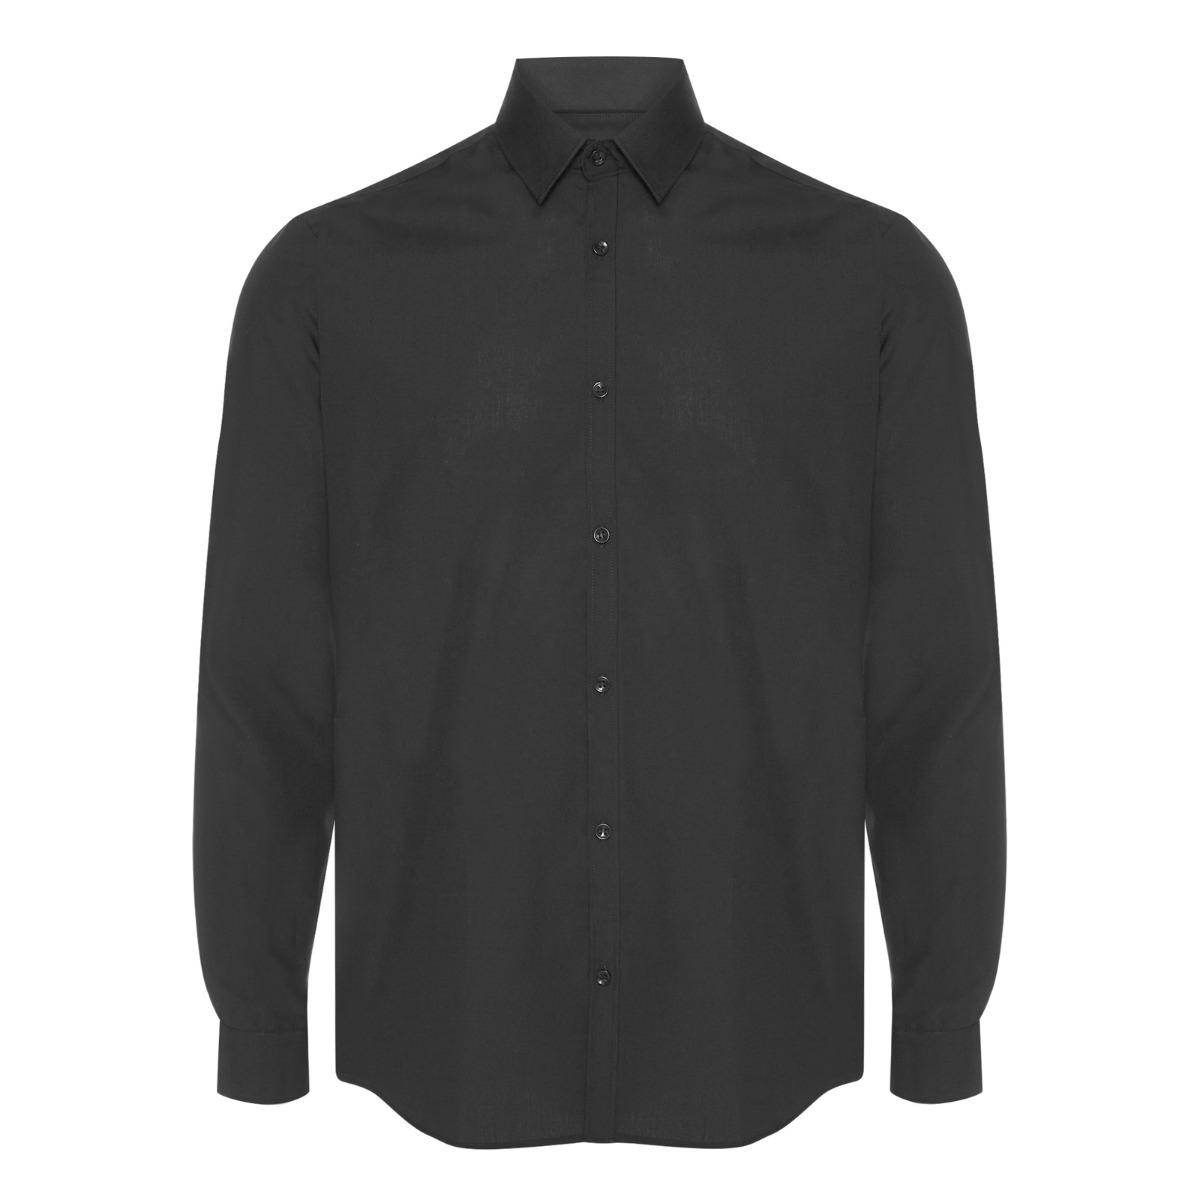 Mens-Black-Formal-Shirt-Long-Sleeve-Regular-Fit-Plain-Business-Work-Collar-Smart thumbnail 3